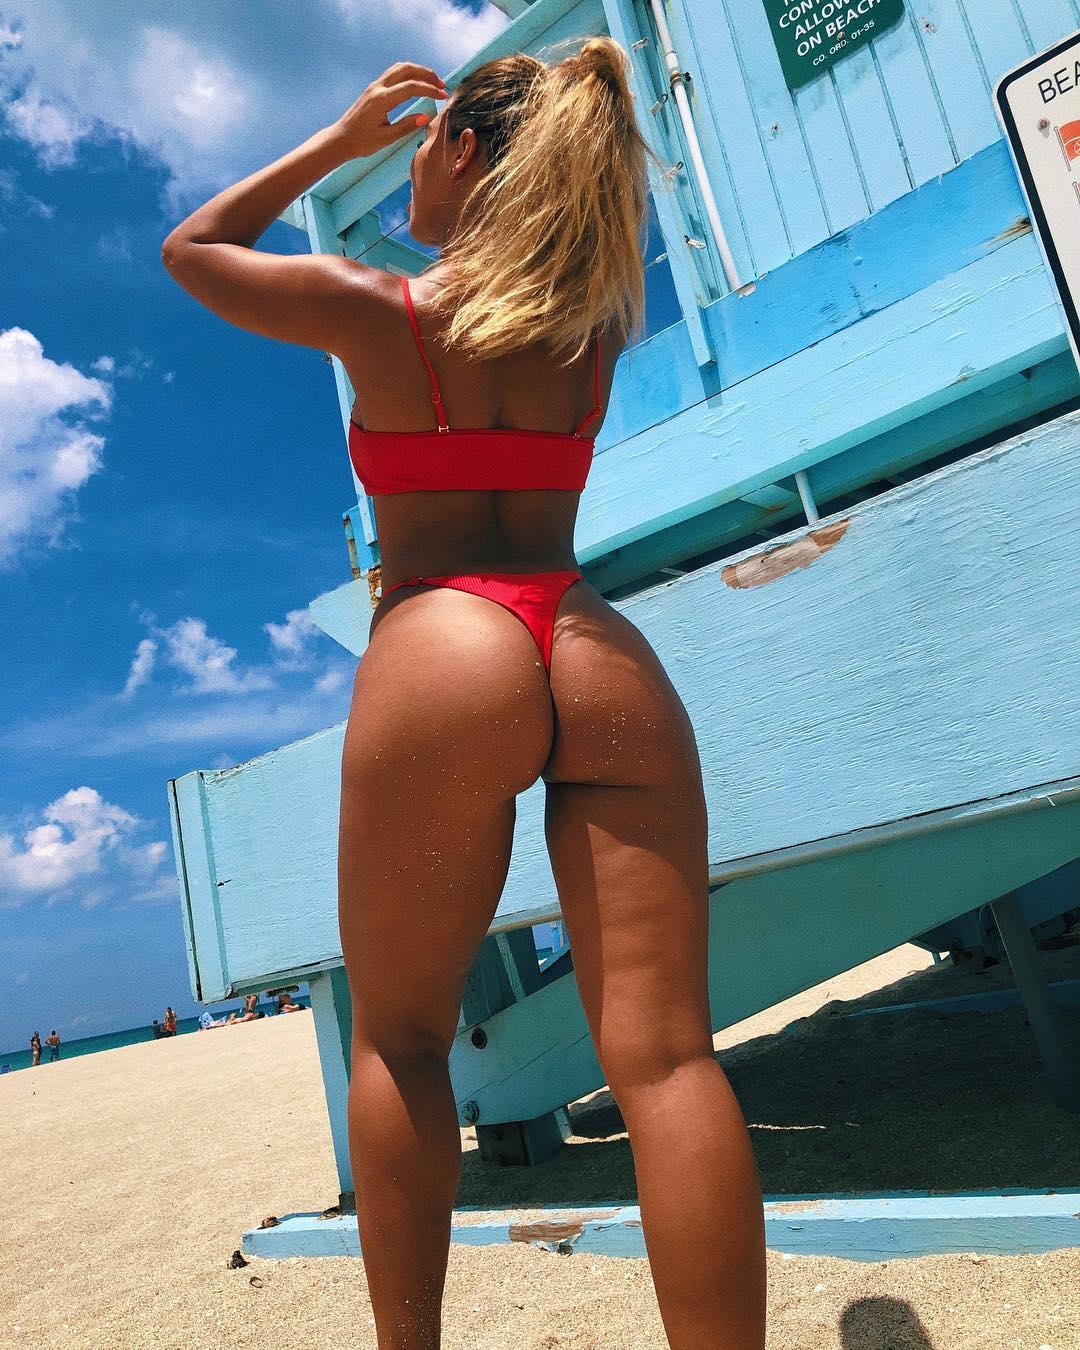 Natalia Garibotto Nude Onlyfans Leaked 0031